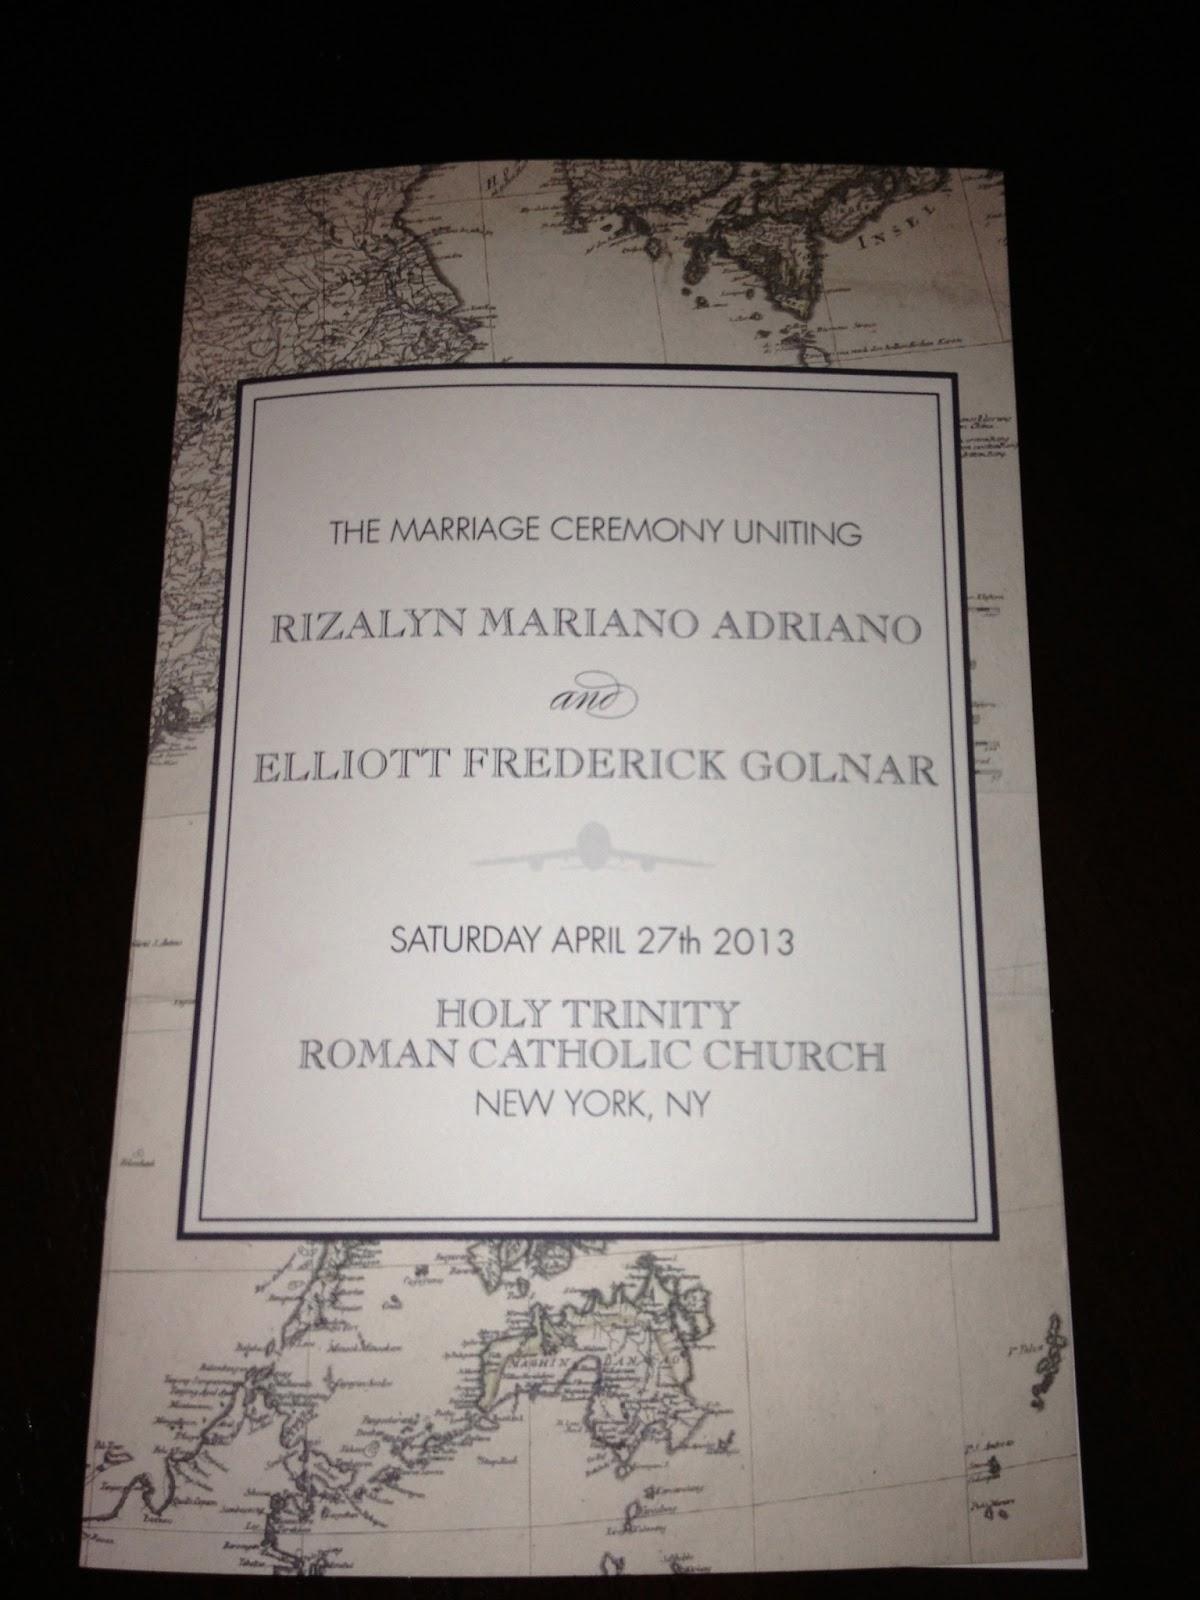 Gracefully Dunn: Travel Themed Wedding Program and Cards